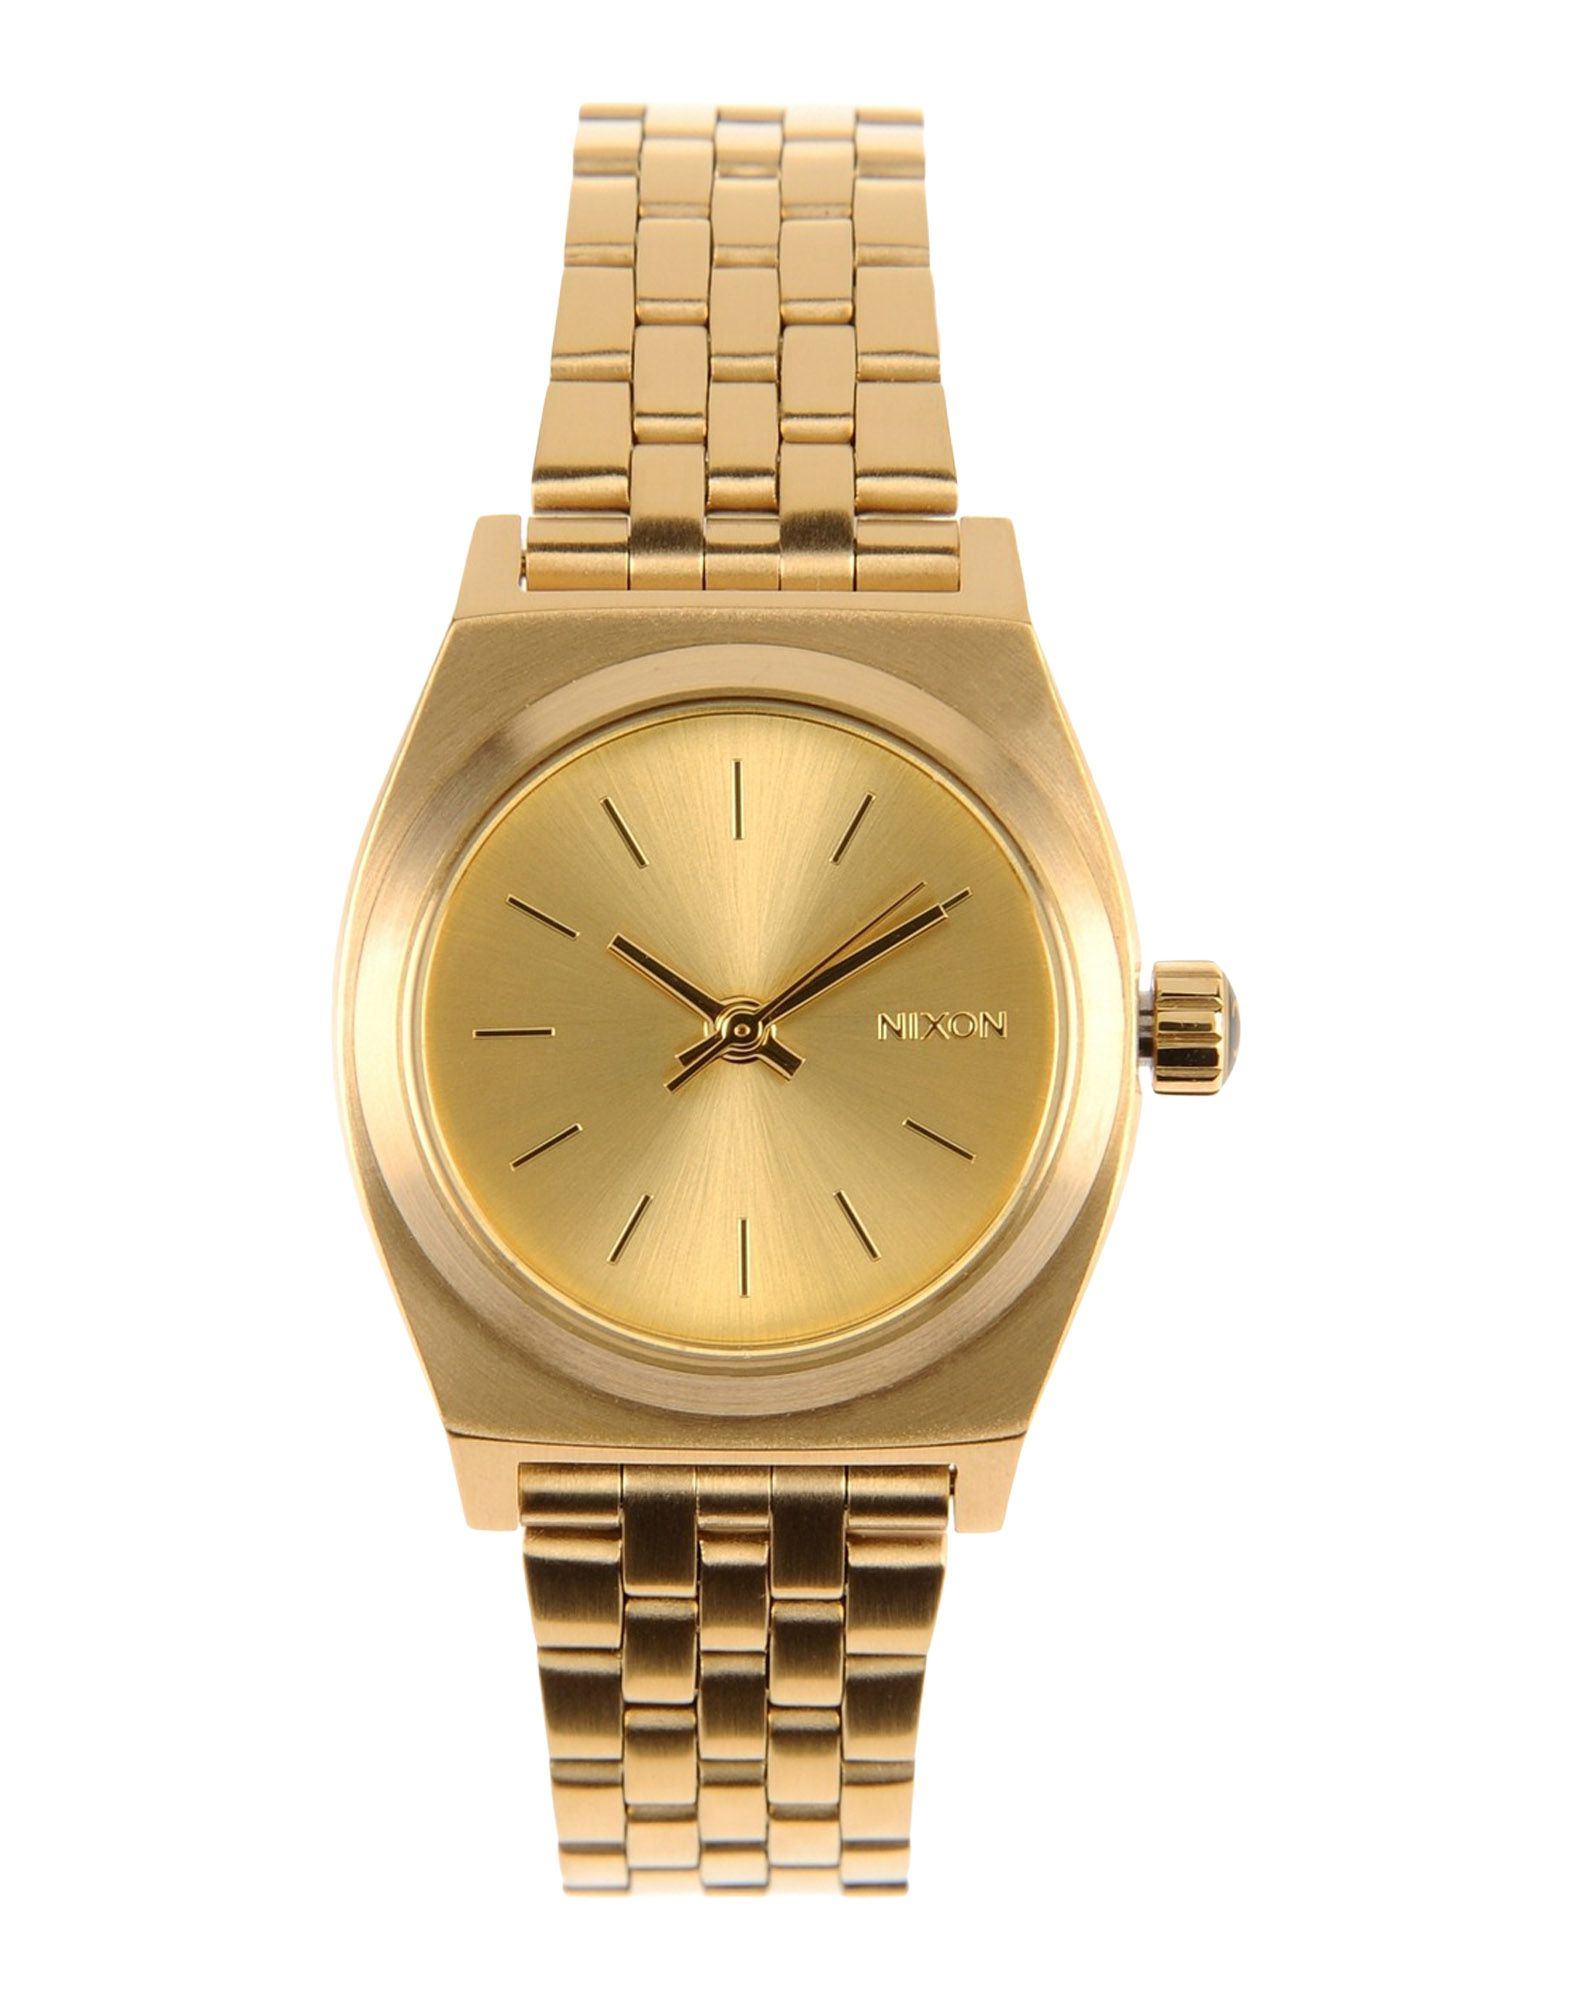 Wrist Watches Photos